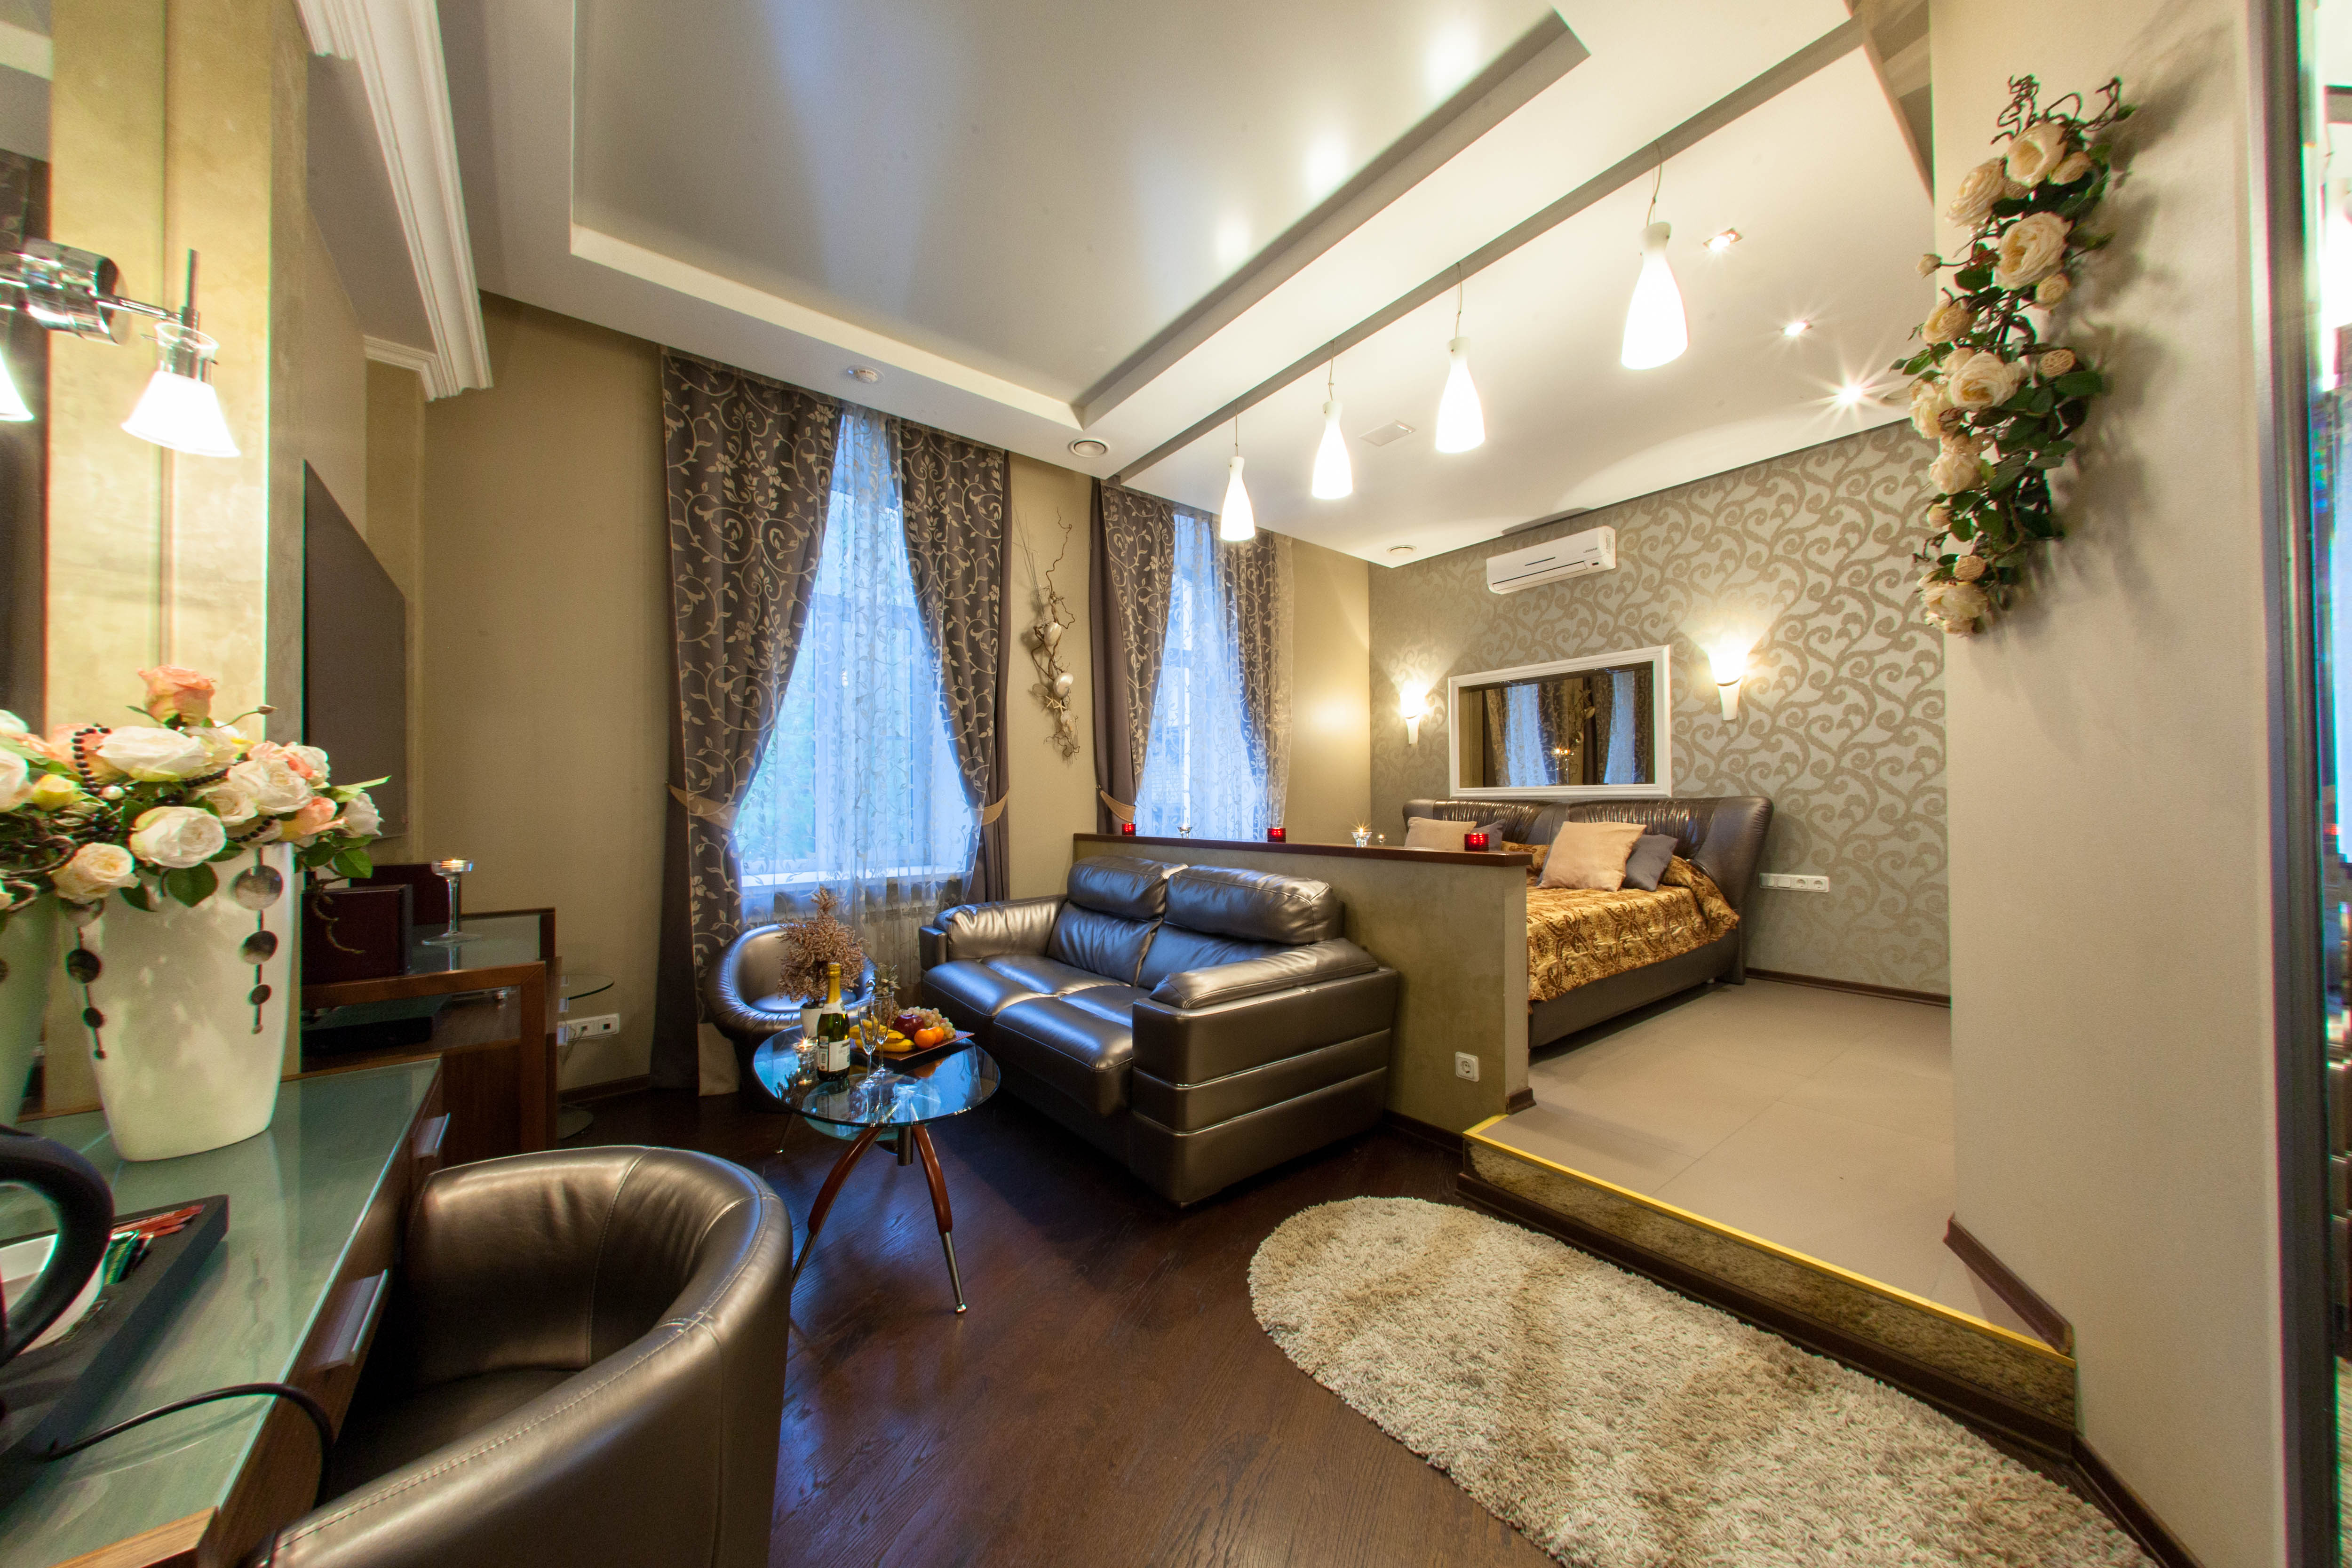 Жемчужная комната в отеле Премиум